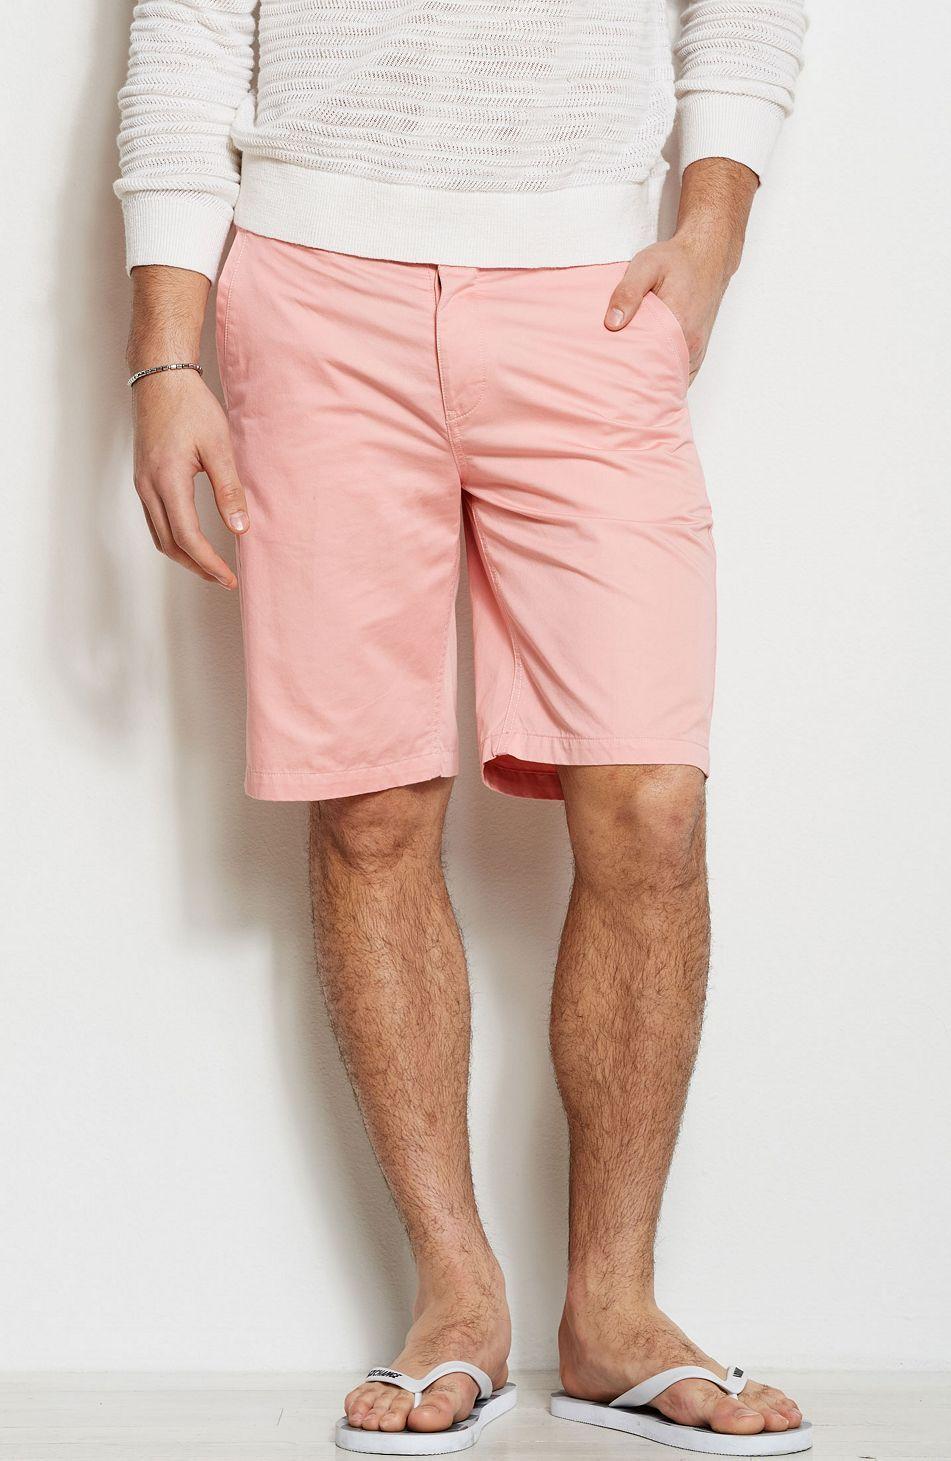 Pink (Chino) Shorts | Personal style | Pinterest